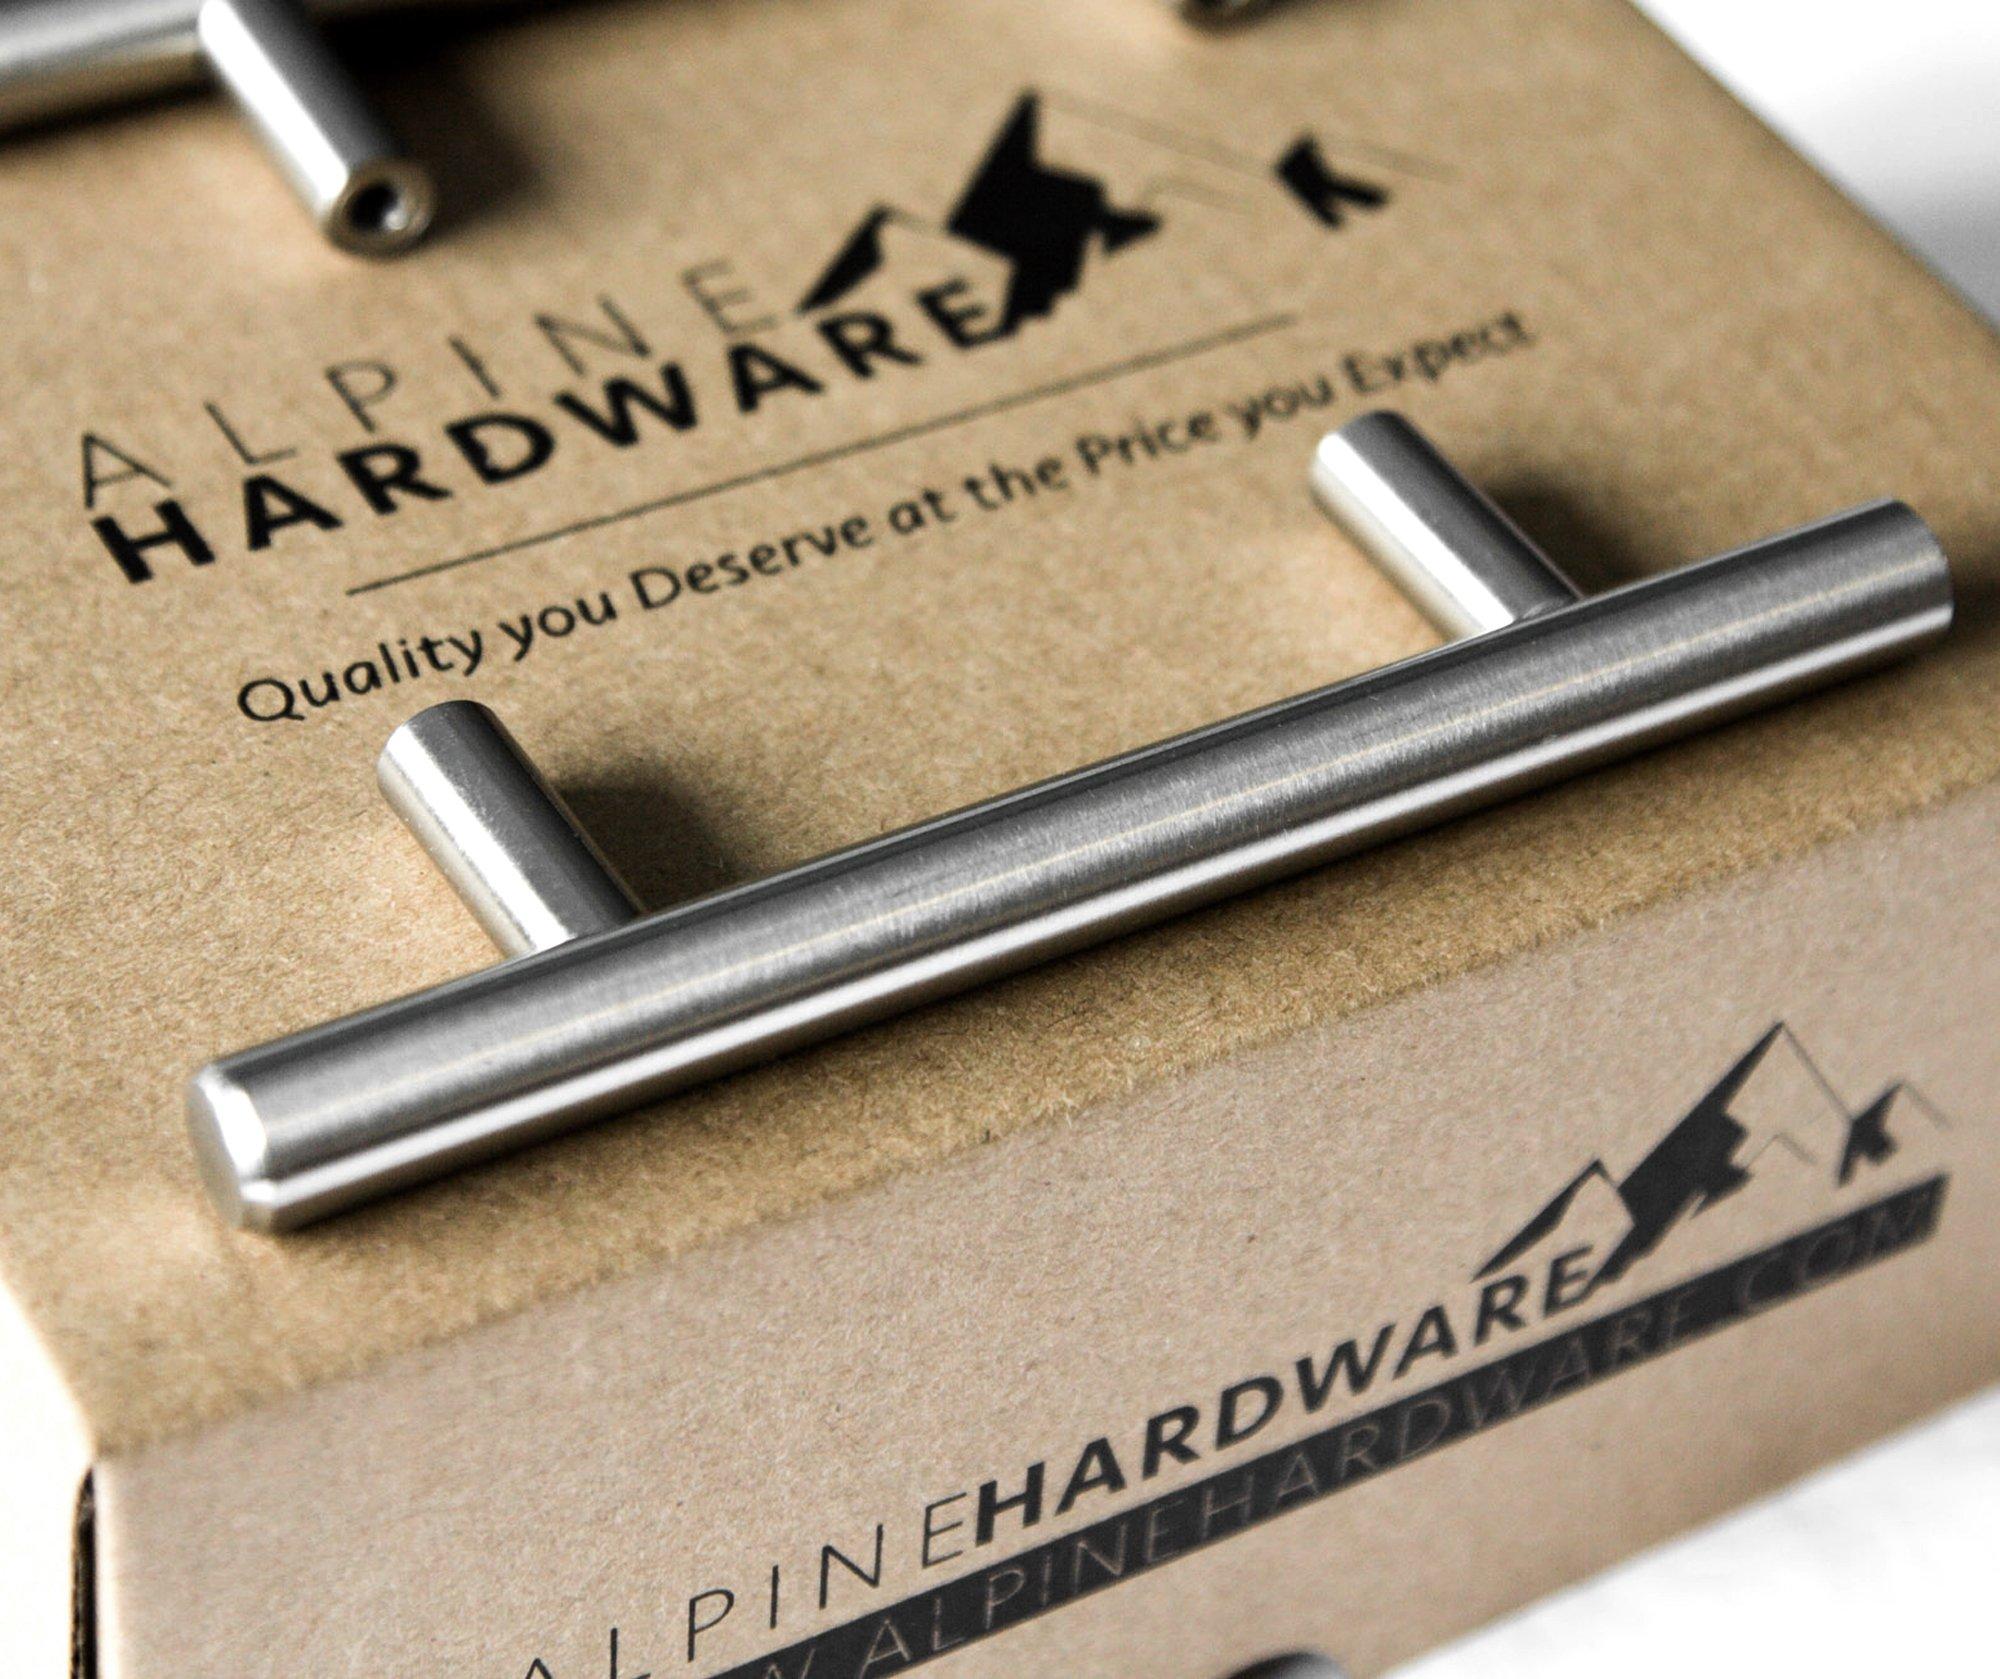 "10pc SOLID Stainless Steel, Bar Handle Pull: Fine-Brushed Satin Nickel Finish   3"" Hole Center   Kitchen Cabinet Hardware / Dresser Drawer Handles By: Alpine Hardware"